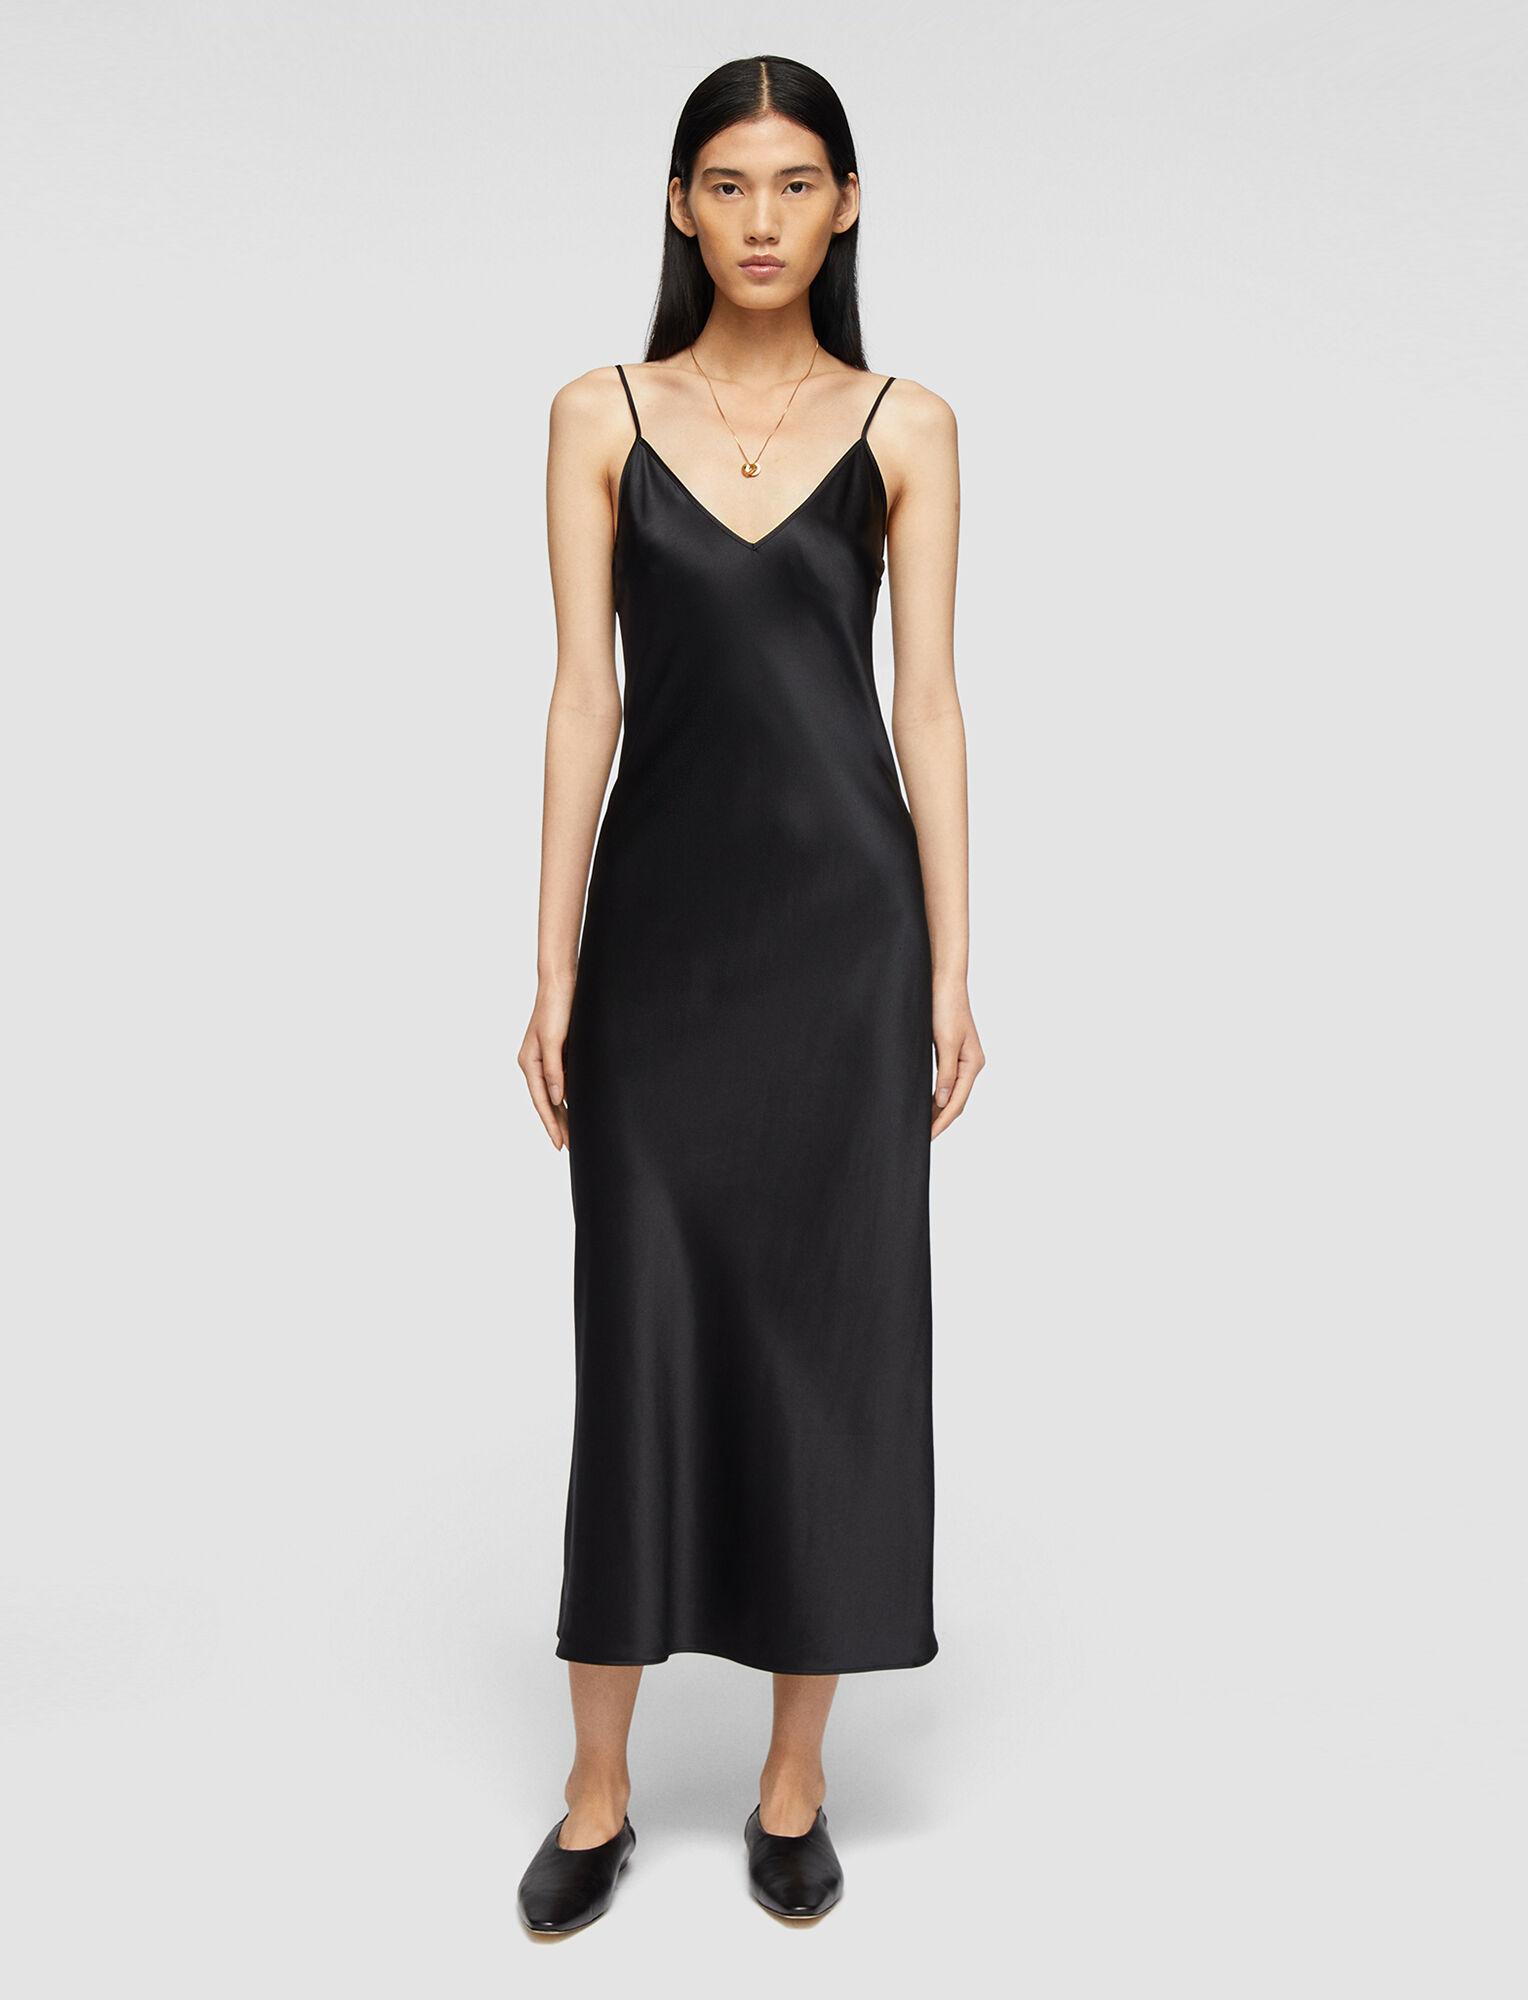 Joseph, Silk Satin Clea Dress, in BLACK